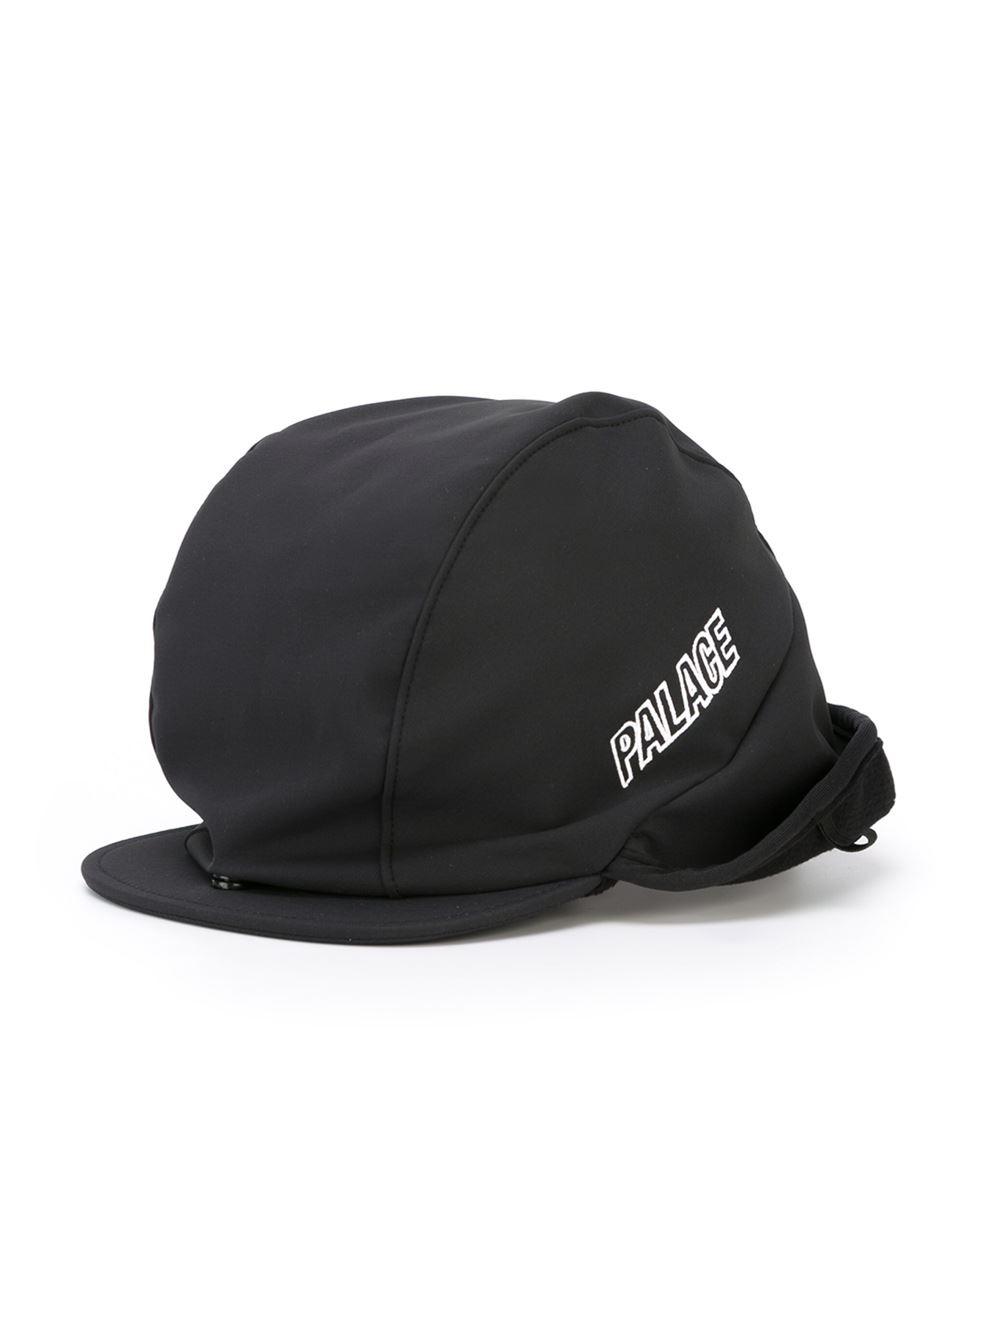 15a38a0dedc Lyst - adidas Originals   X Palace  Hat in Black for Men